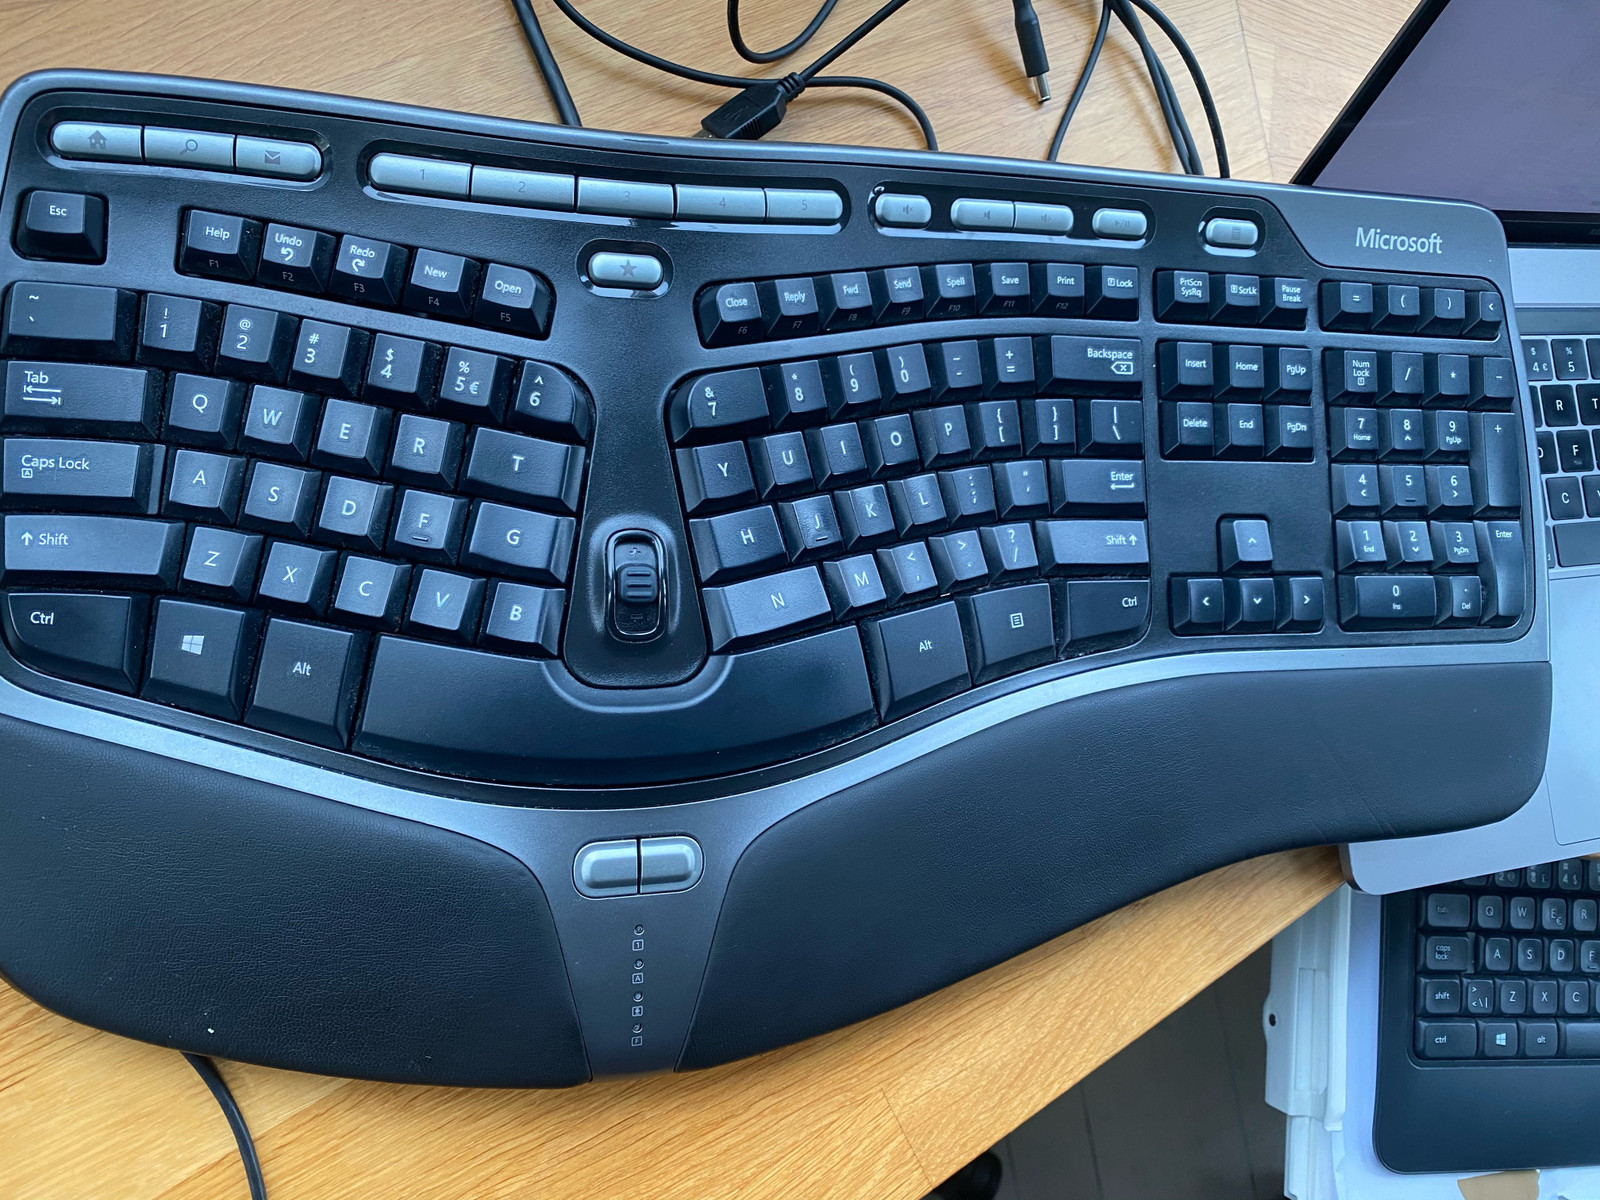 MICROSOFT MS Natural Ergonomic Keybord 4000 Nordic   Milrab.no